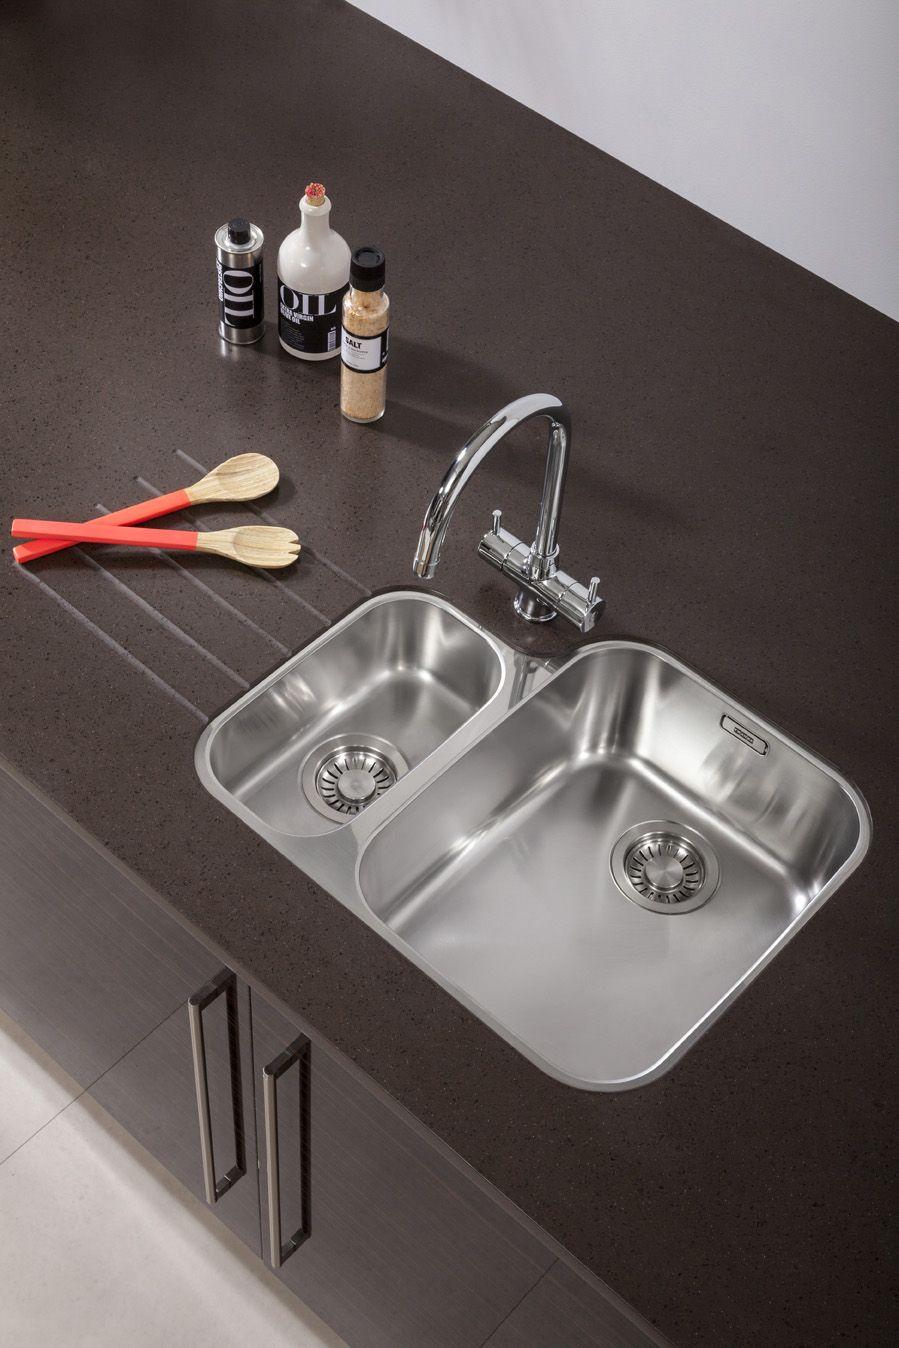 Franke Ariane Undermount Sink And Athena Tap In Chrome Franke